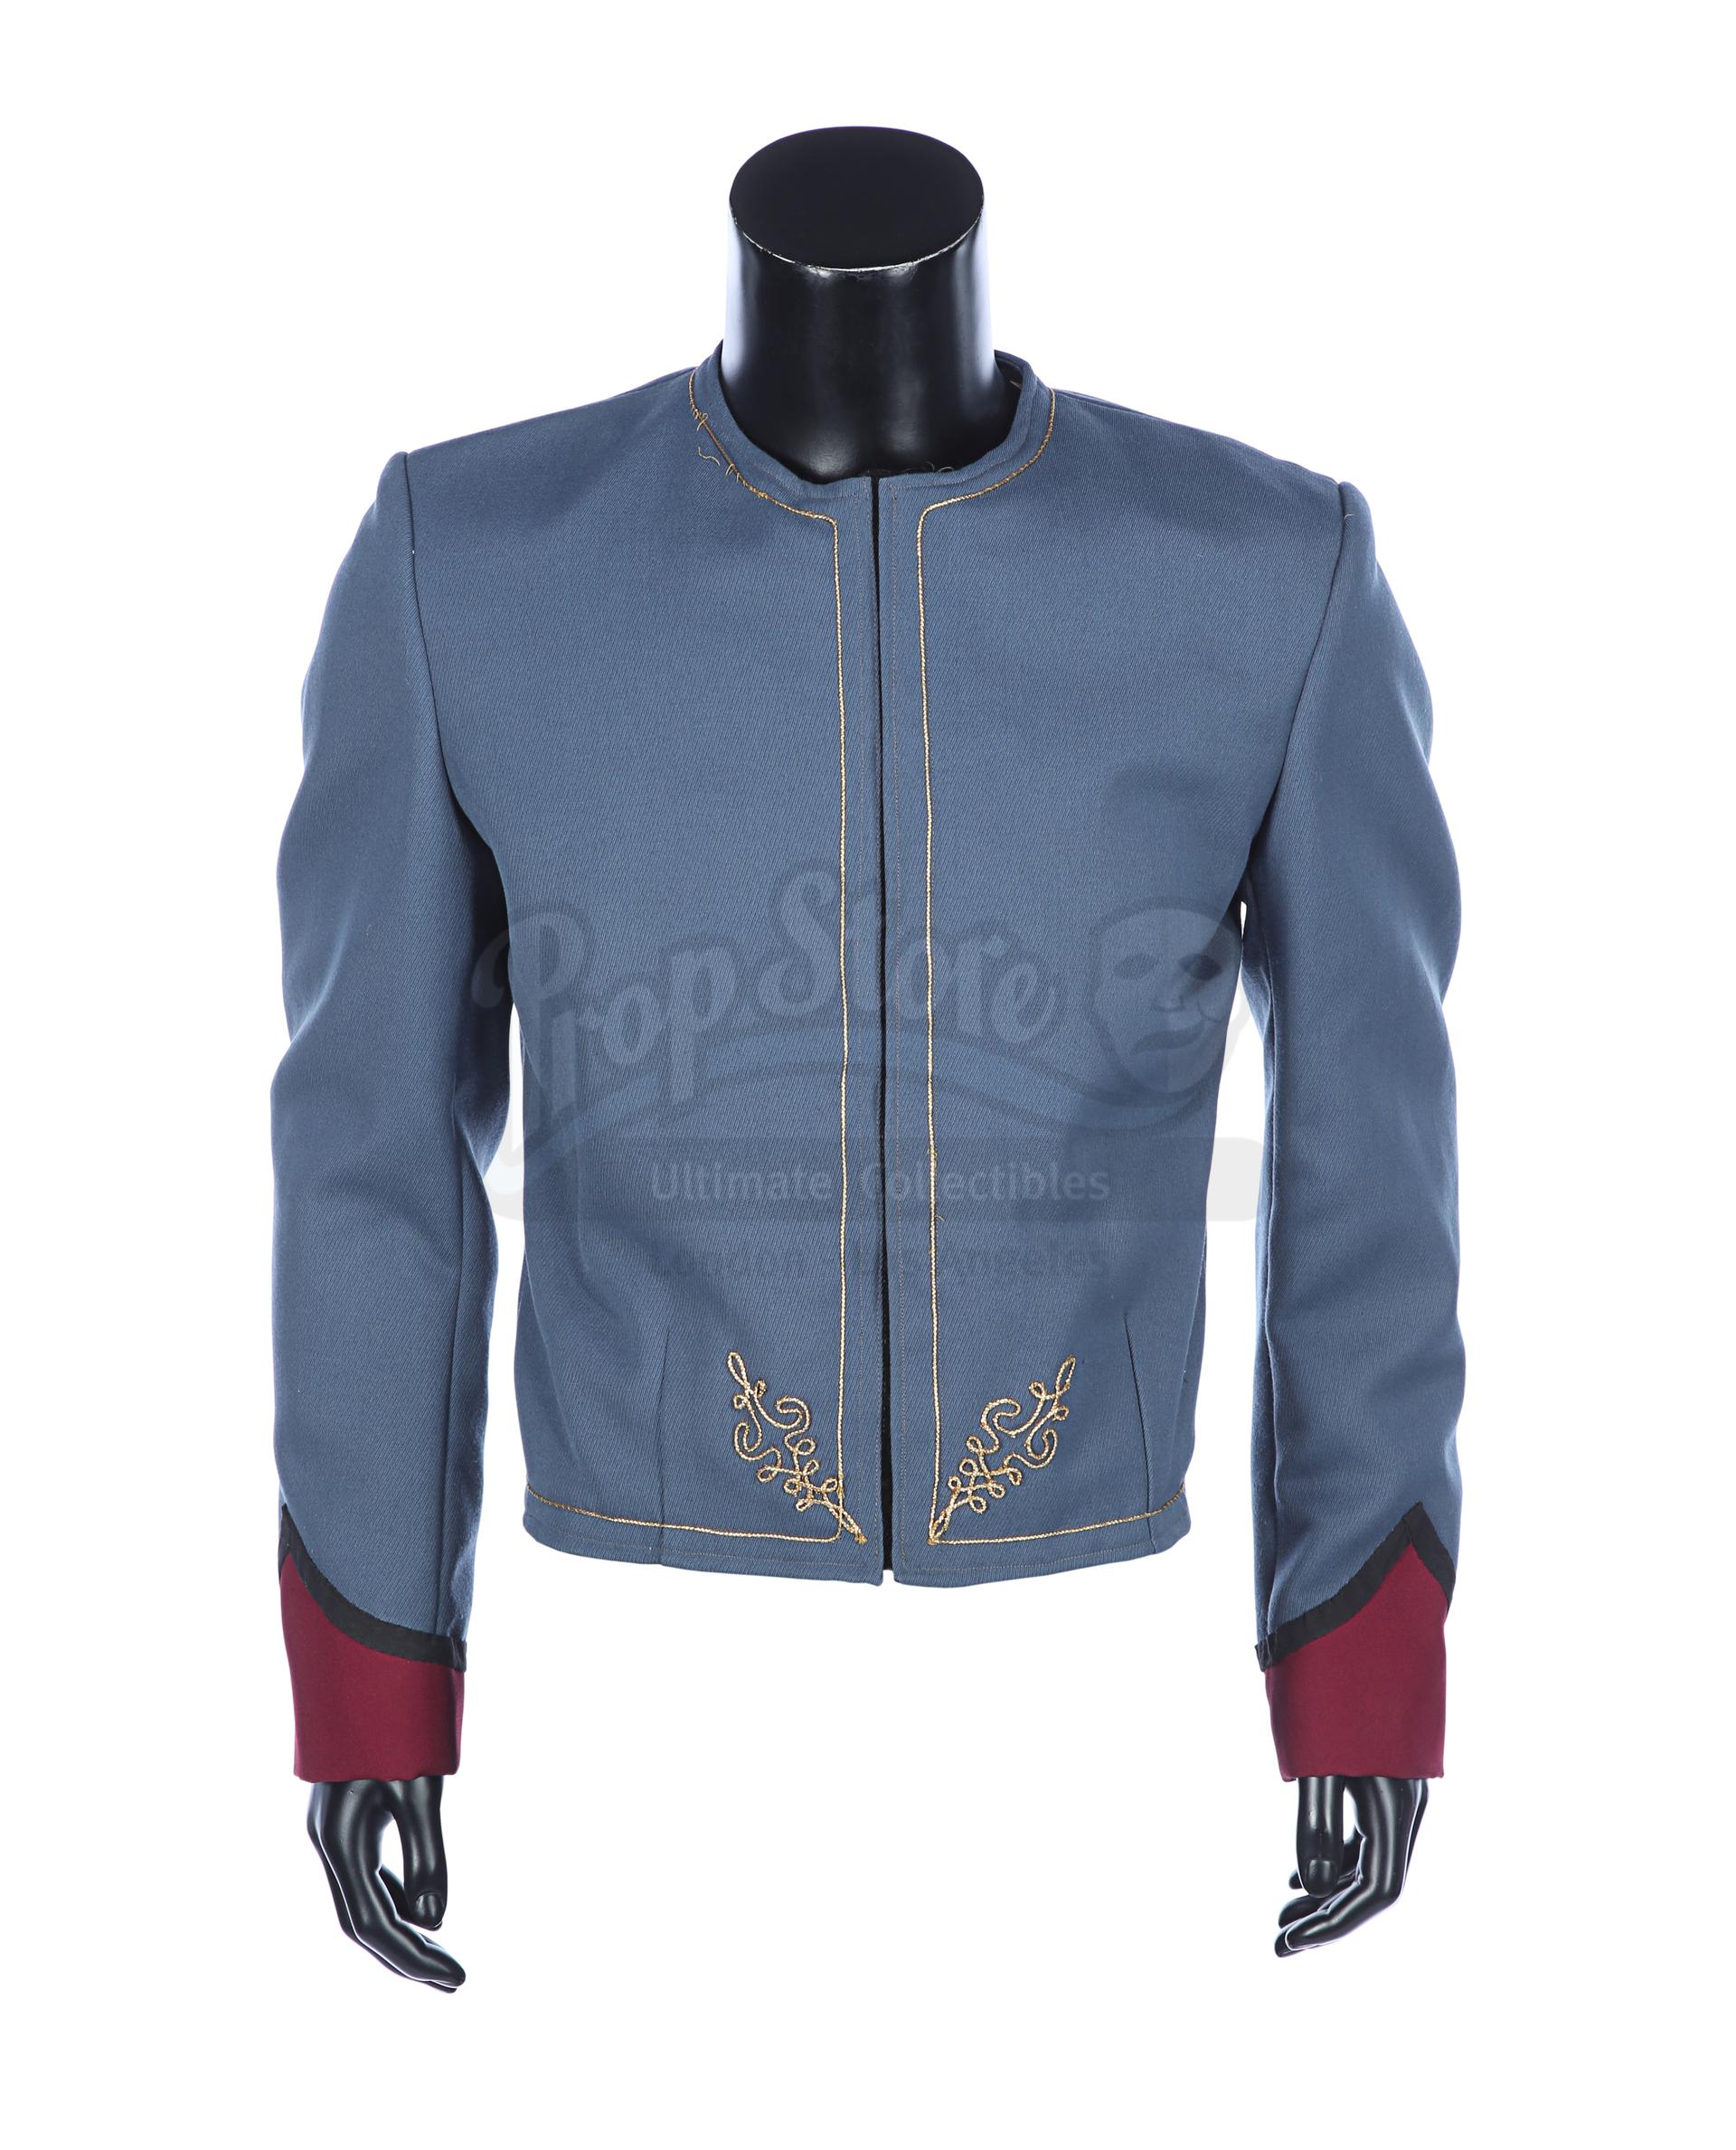 Lot # 306: STAR WARS - EP V - THE EMPIRE STRIKES BACK - Bespin Guard Jacket